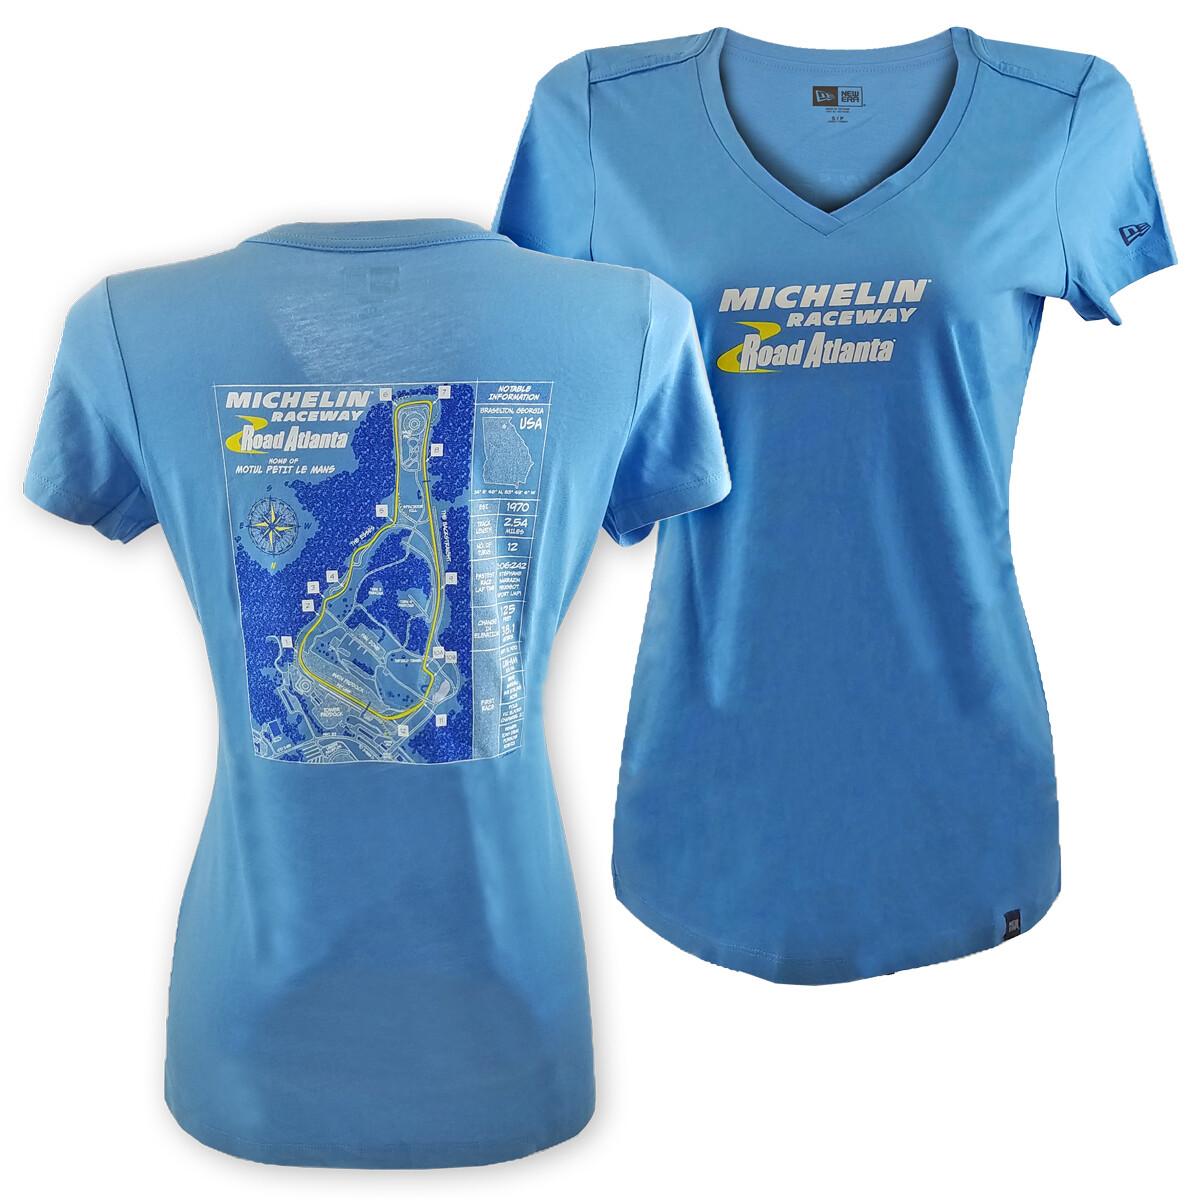 Michelin Raceway Road Atlanta Ladies Track Blueprint Tee - Sky Blue